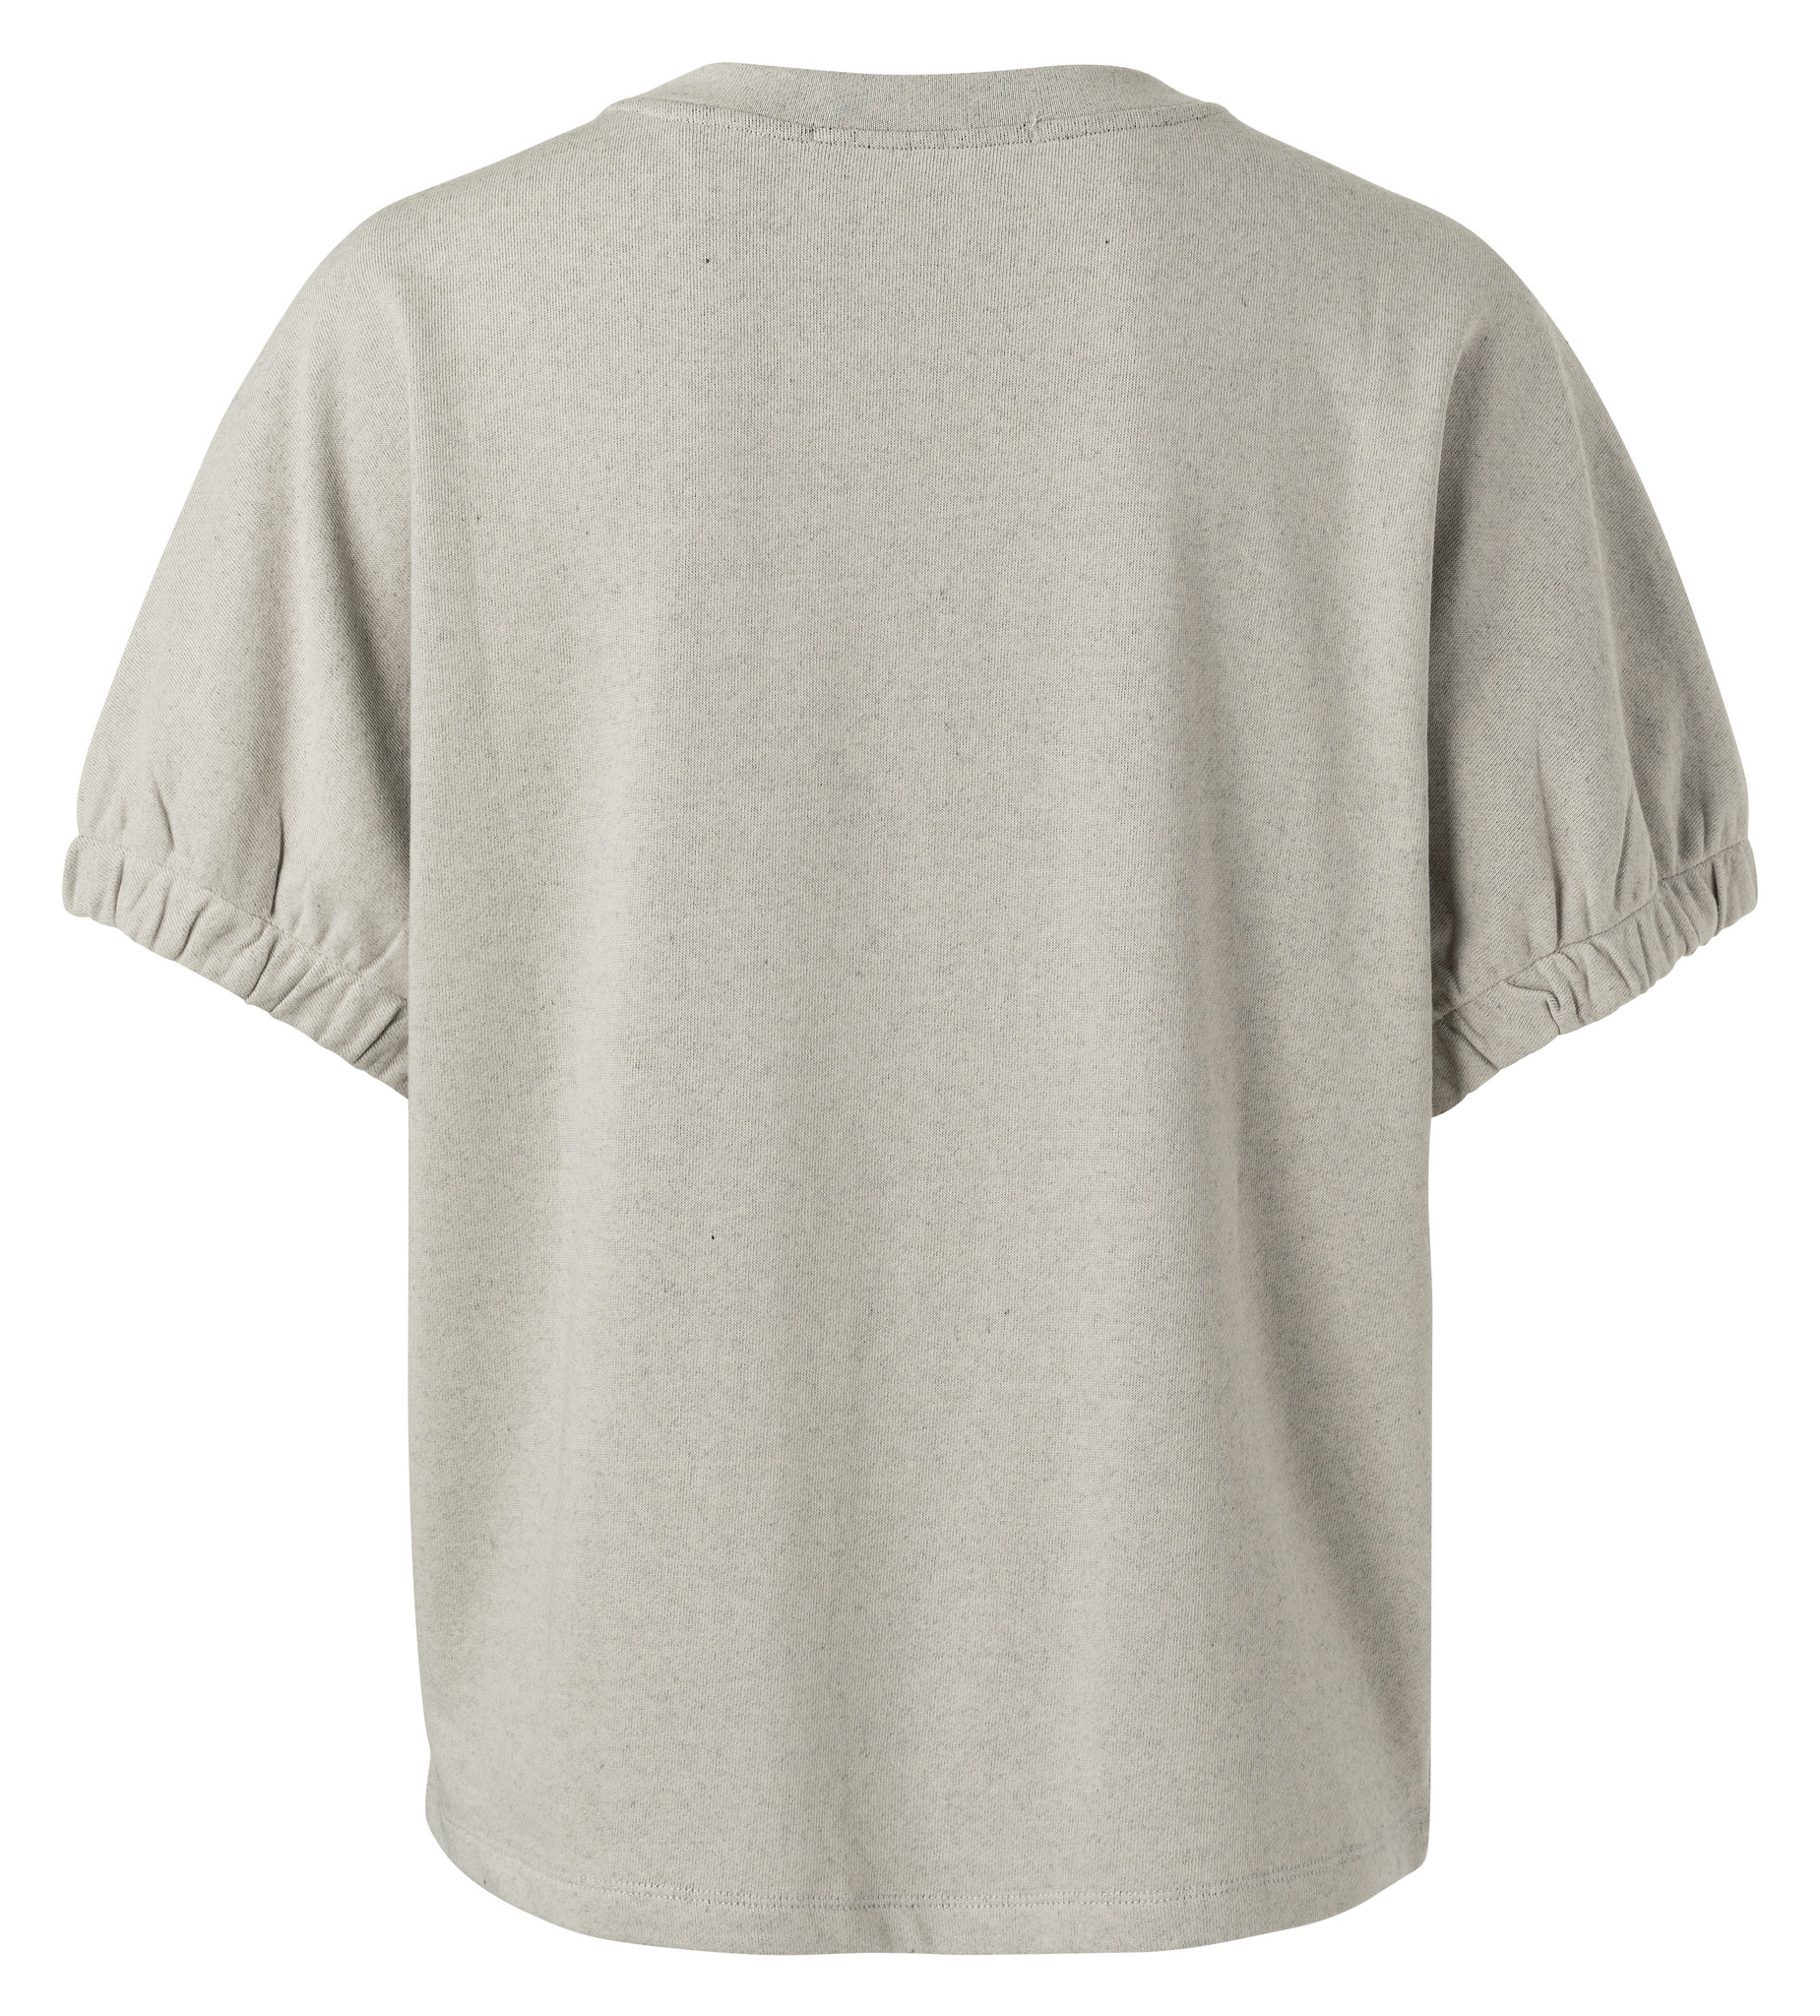 yaya Elastic cuff sweater 1009429-113-3